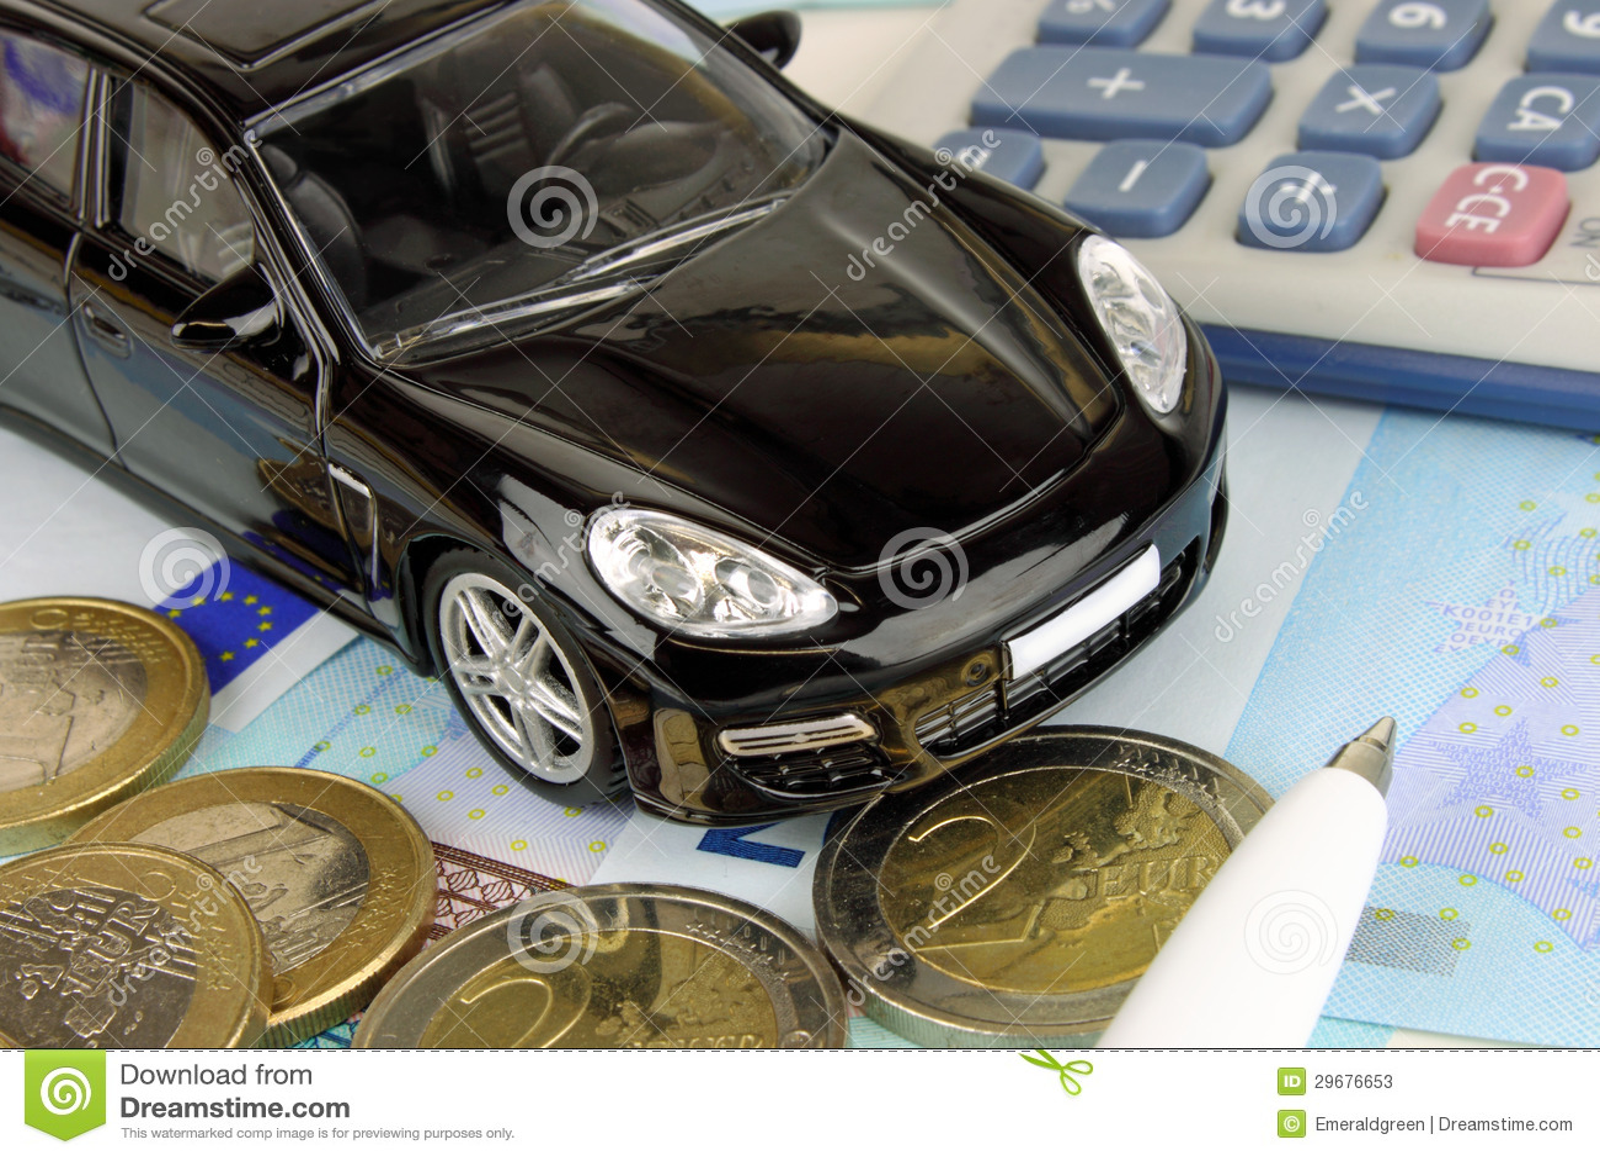 Motor Finance Stock Photos Image 29676653